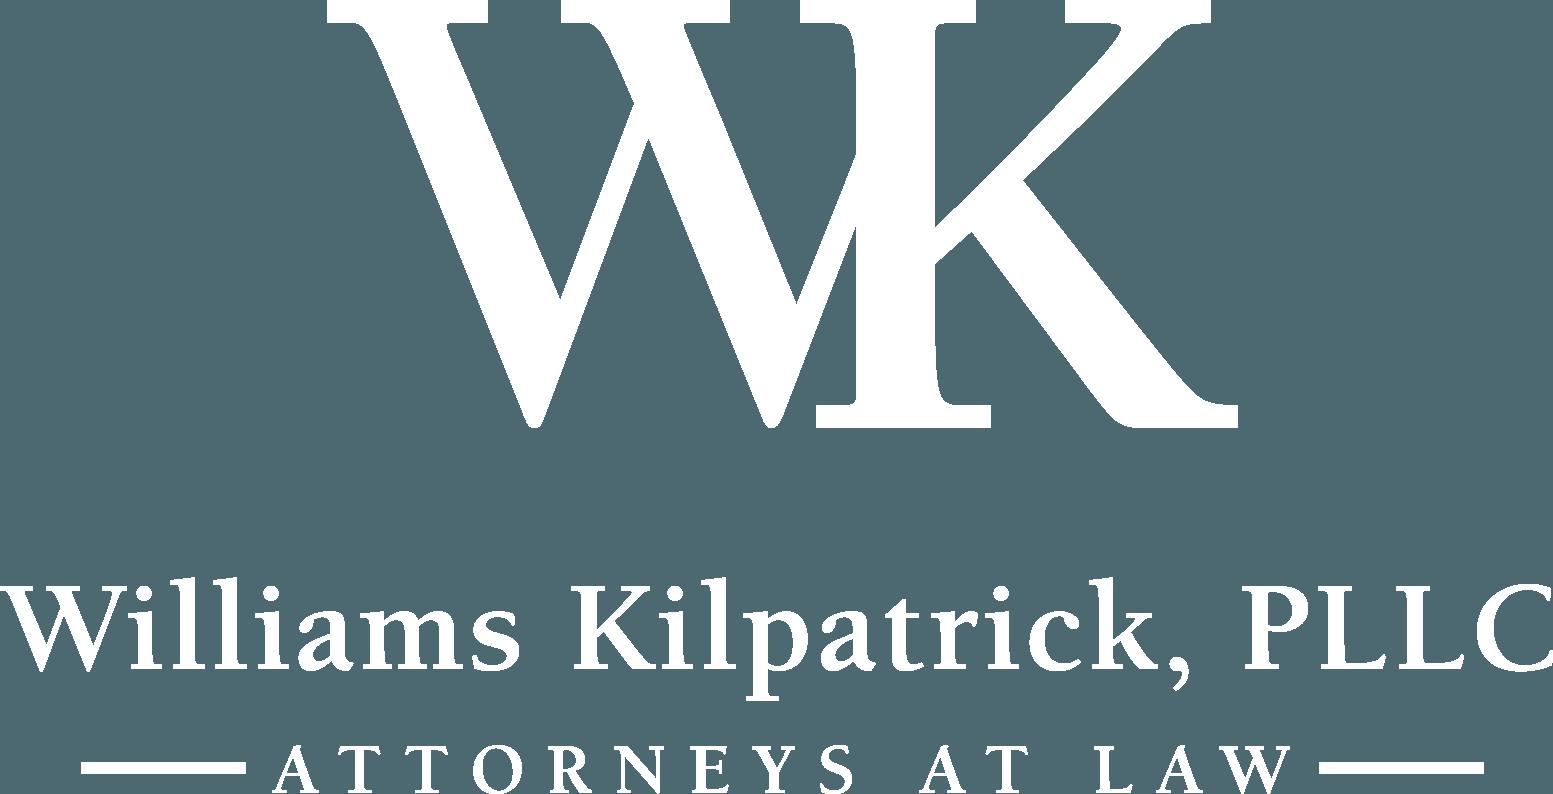 Williams_Kilpatrick_FullLockup_White (1)